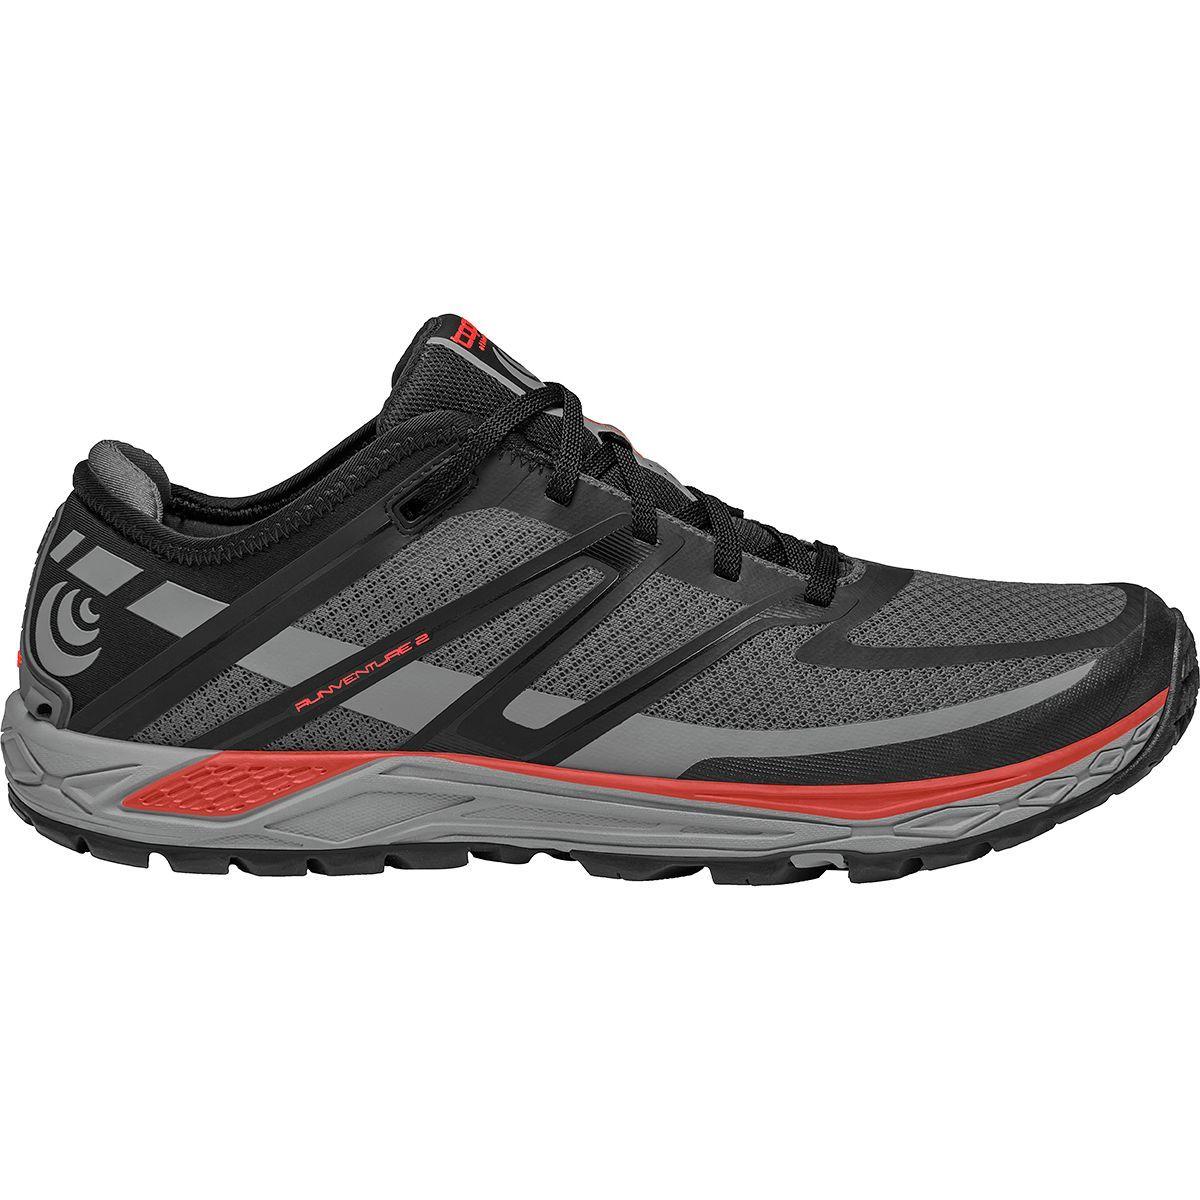 Runventure 3 Trail Running Shoe Men S Mens Trail Running Shoes Shoes Mens Running Shoes